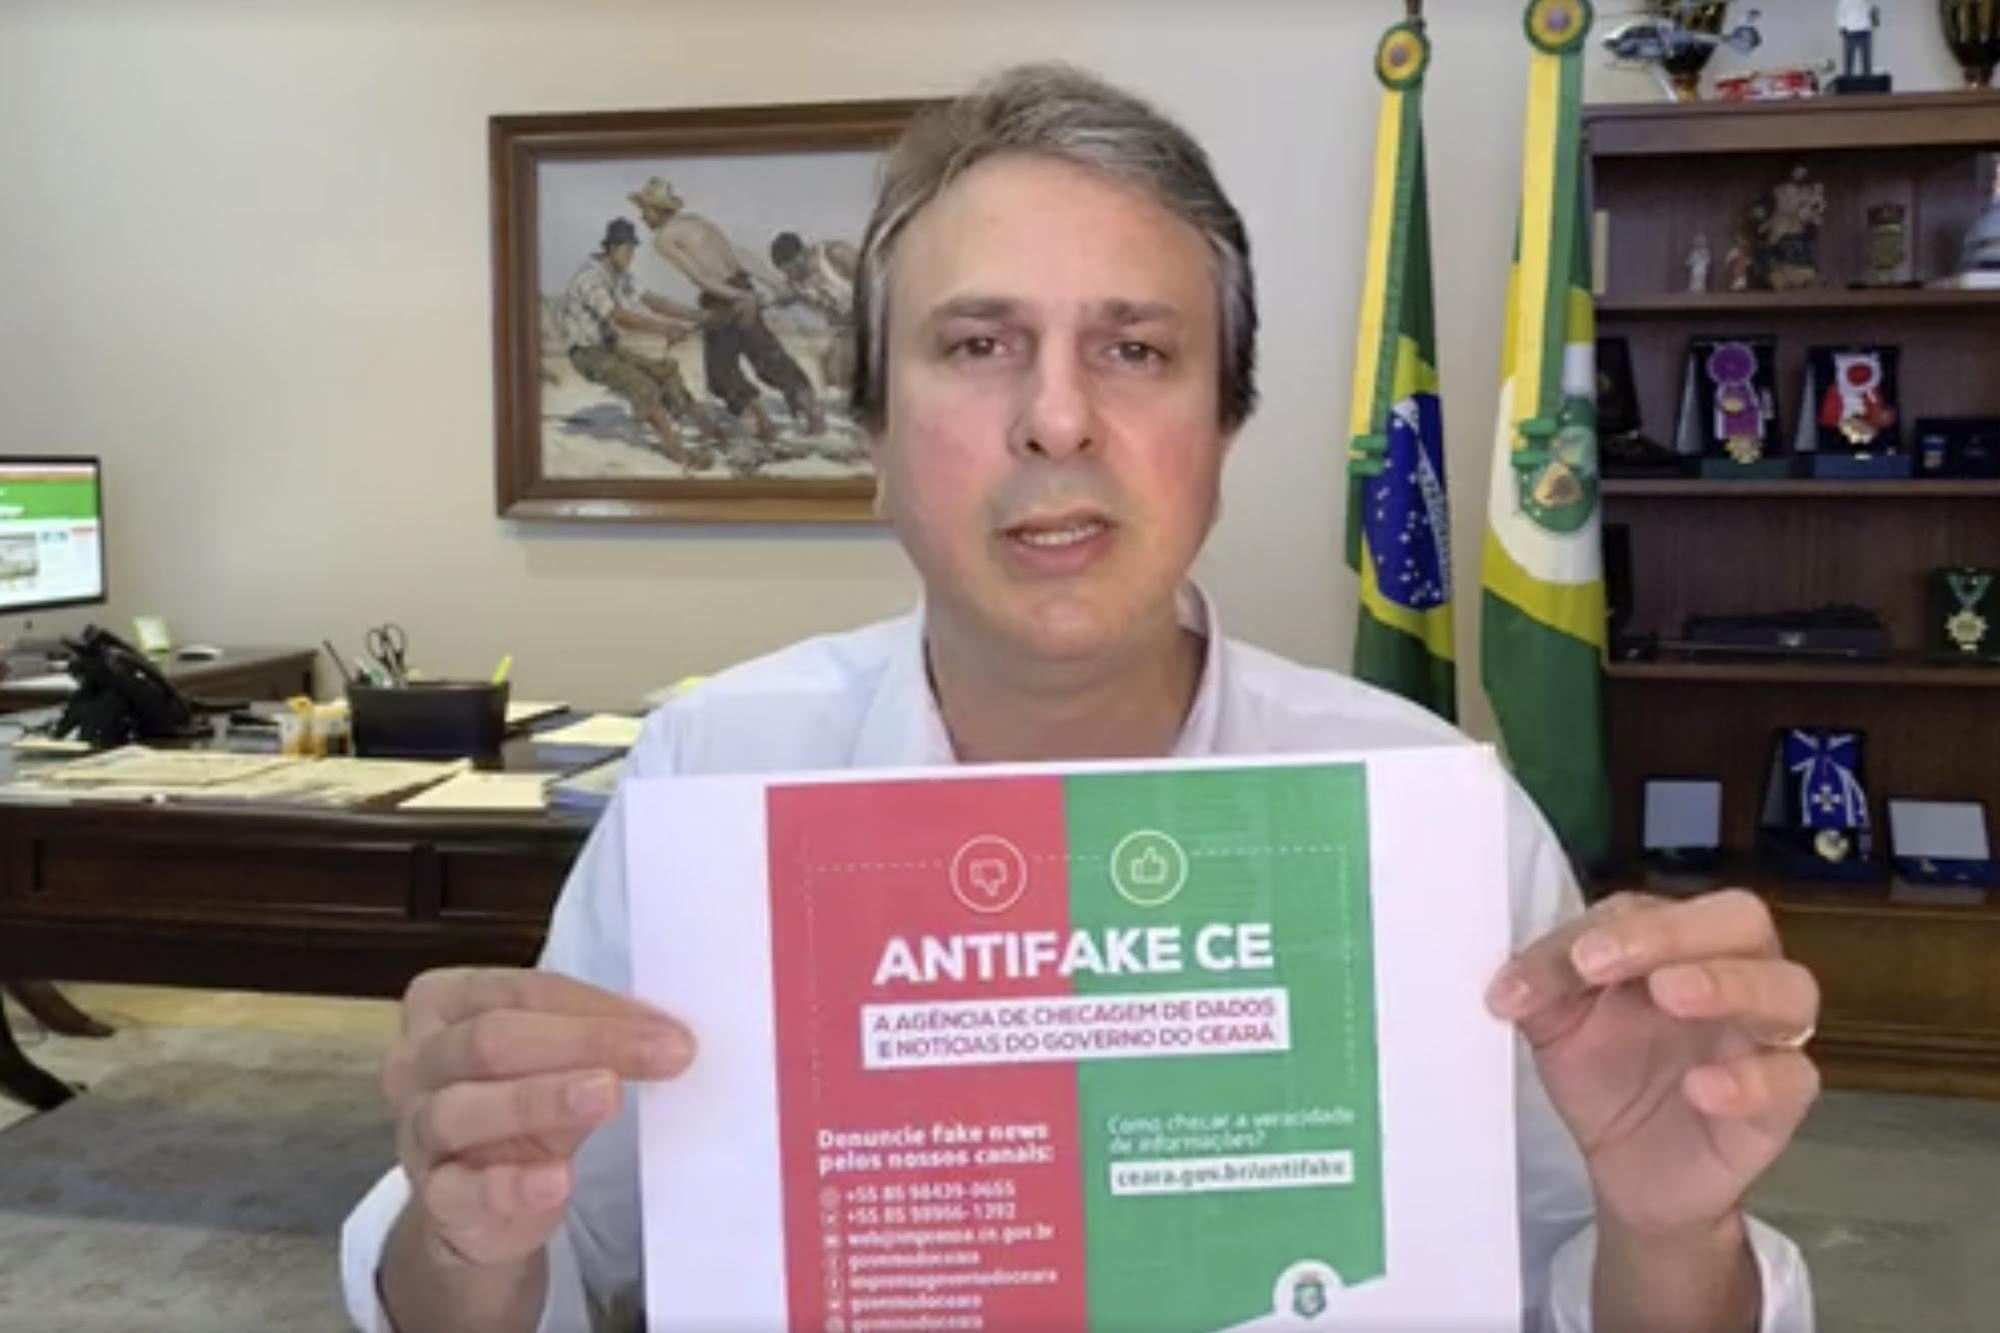 Ceará ultrapassa 400 UTIs para Covid-19 e ganha lei contra Fake News